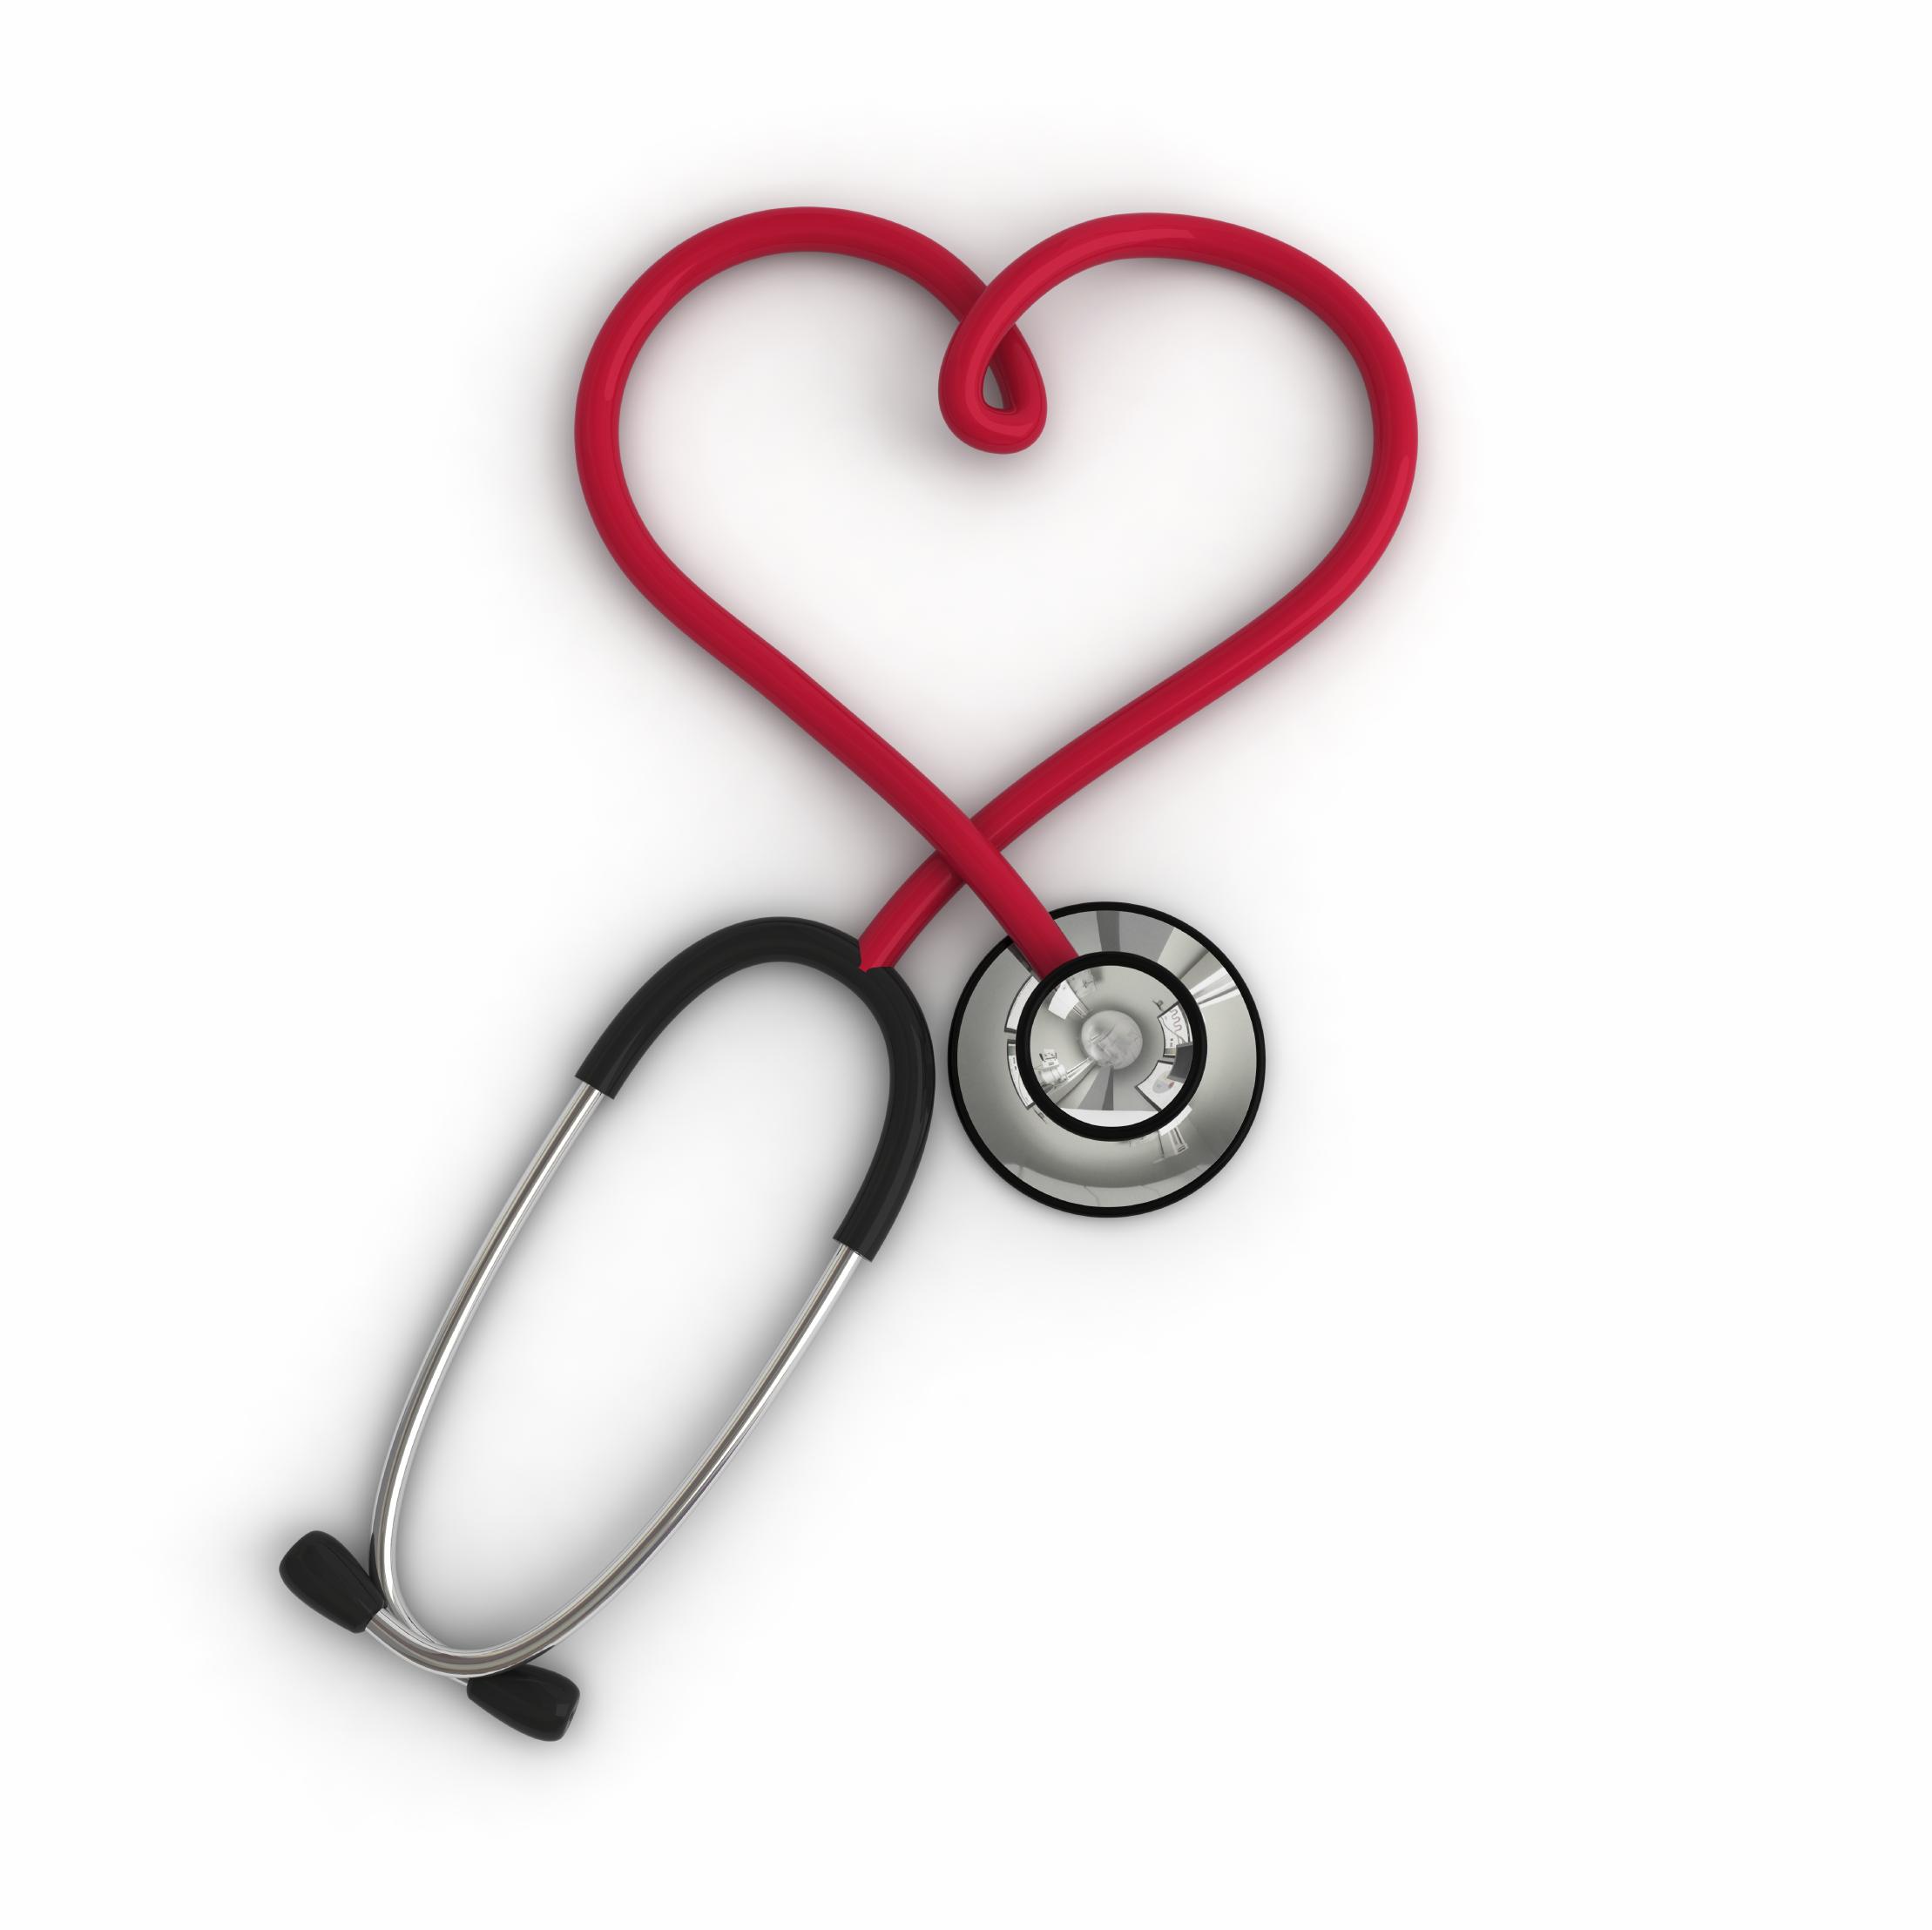 Cum prevenim aparitia hipertensiunii arteriale?